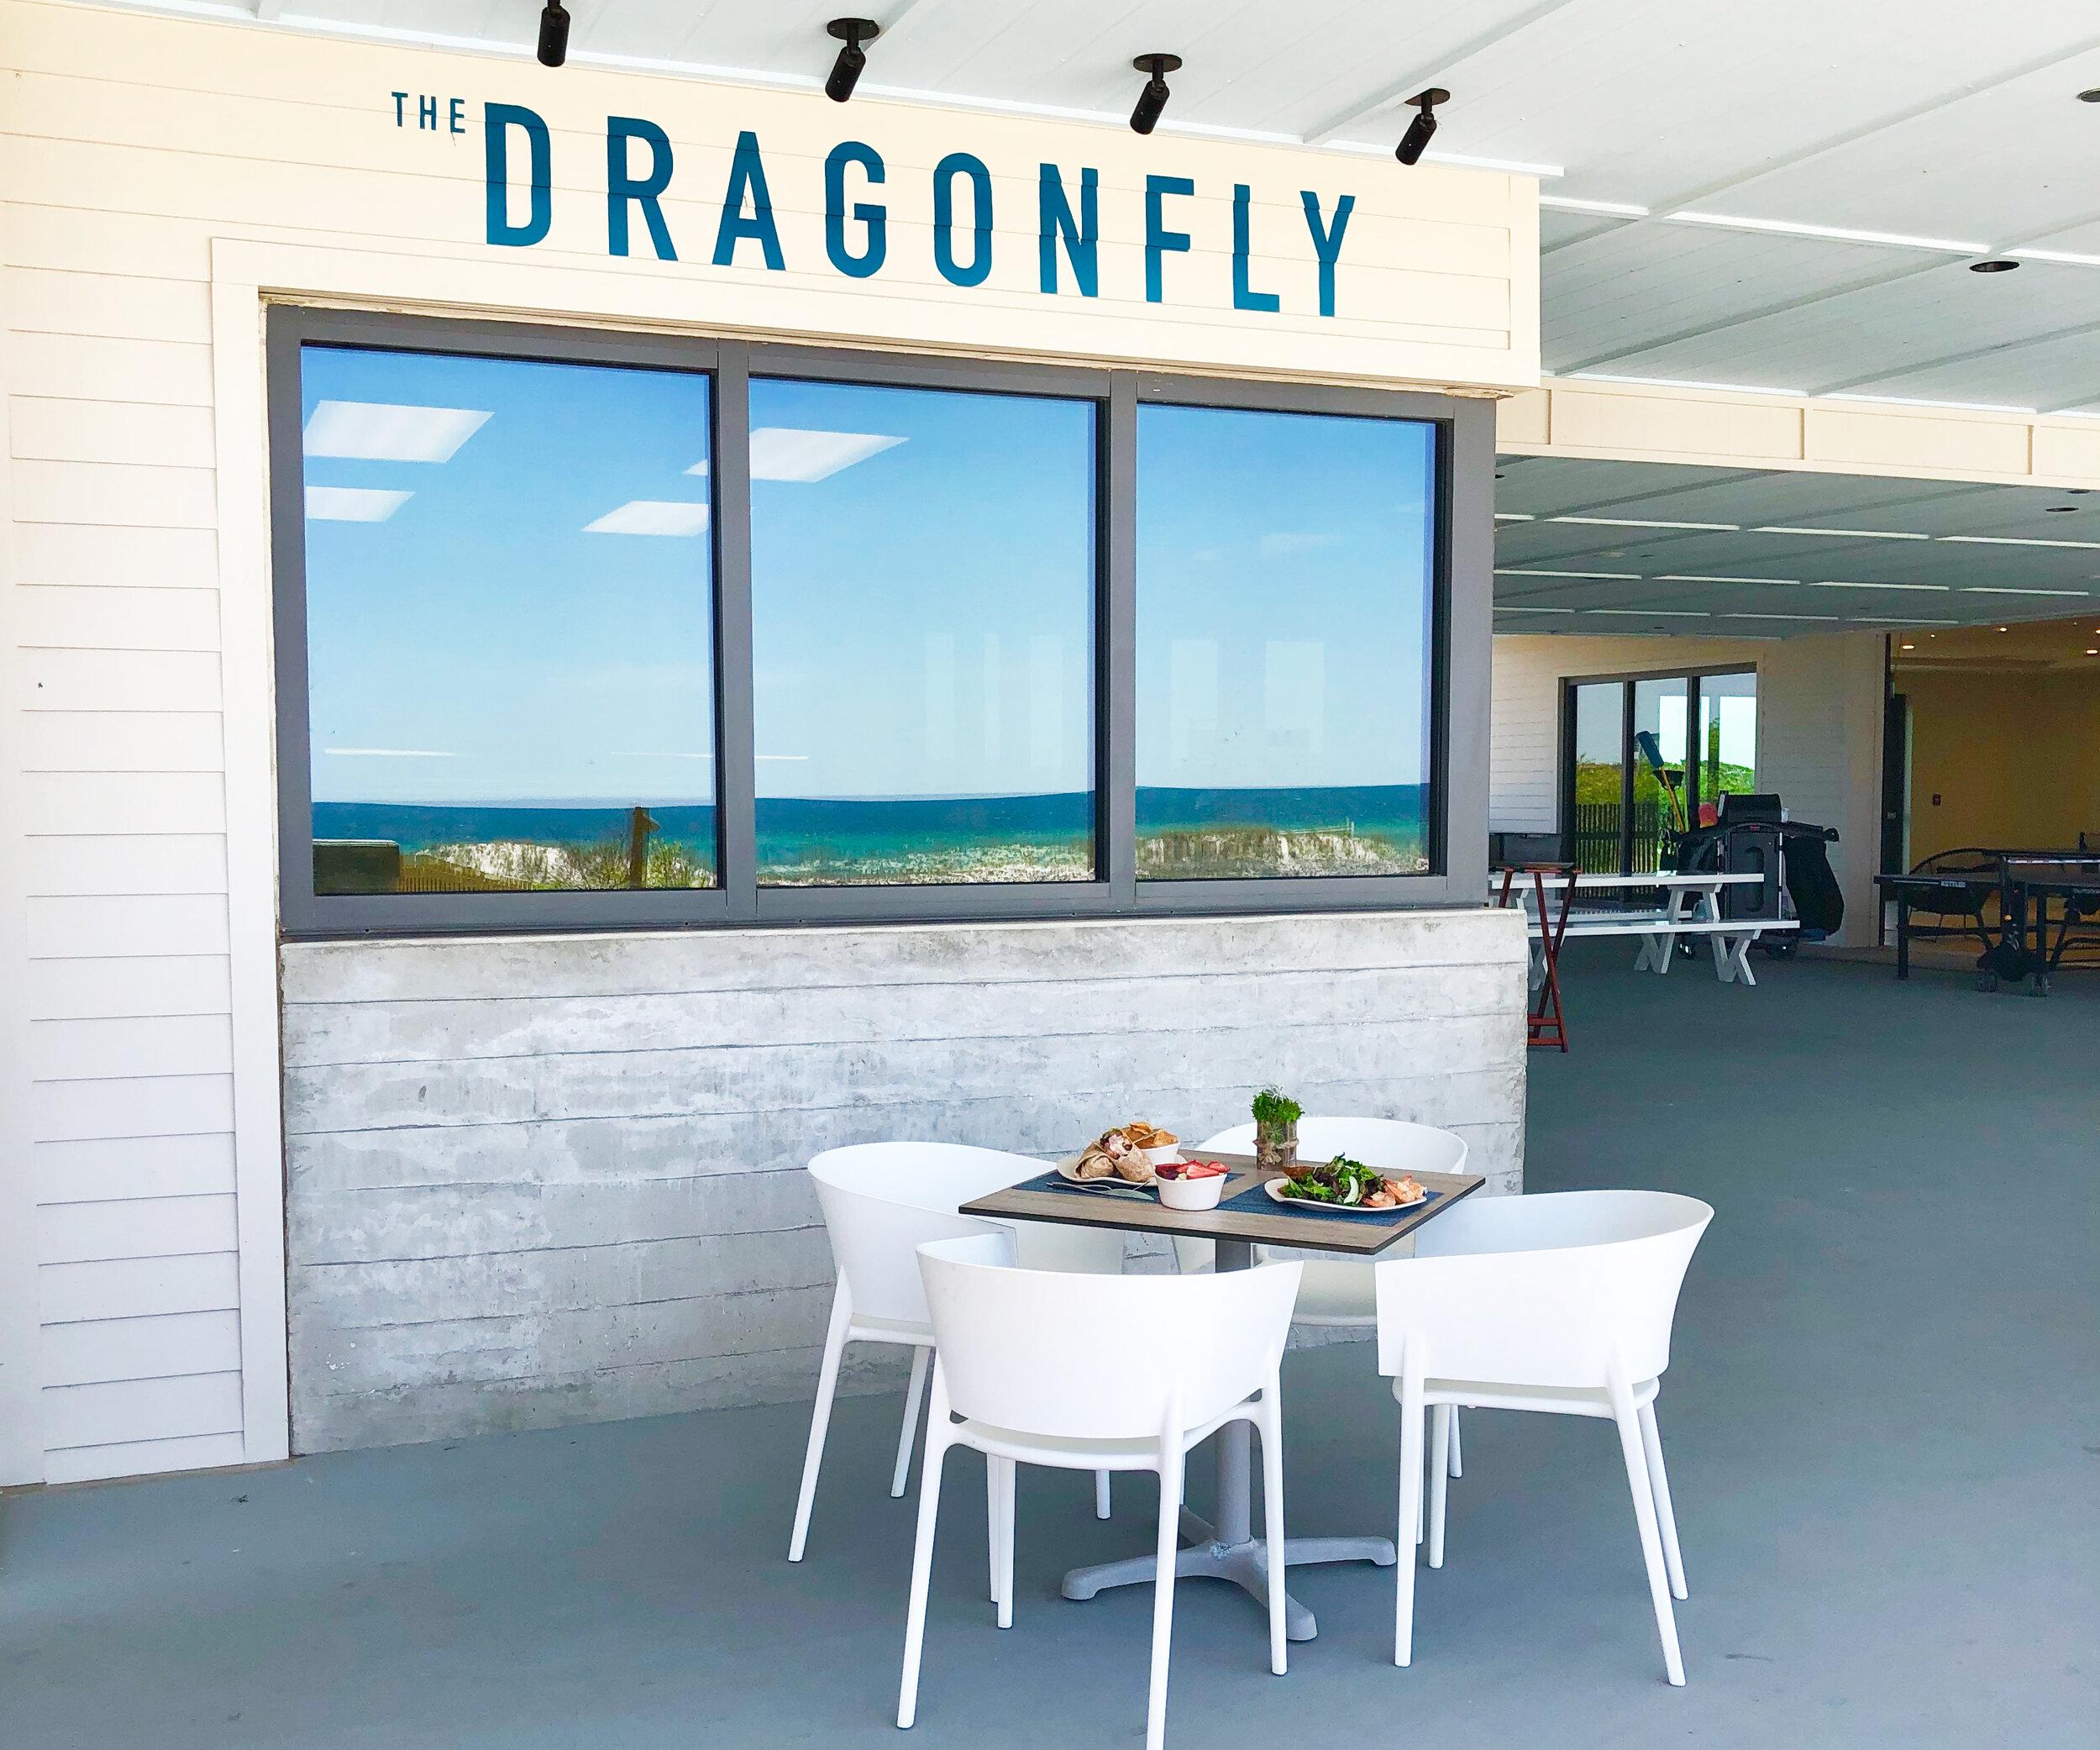 Dragonfly Restaurant.jpg